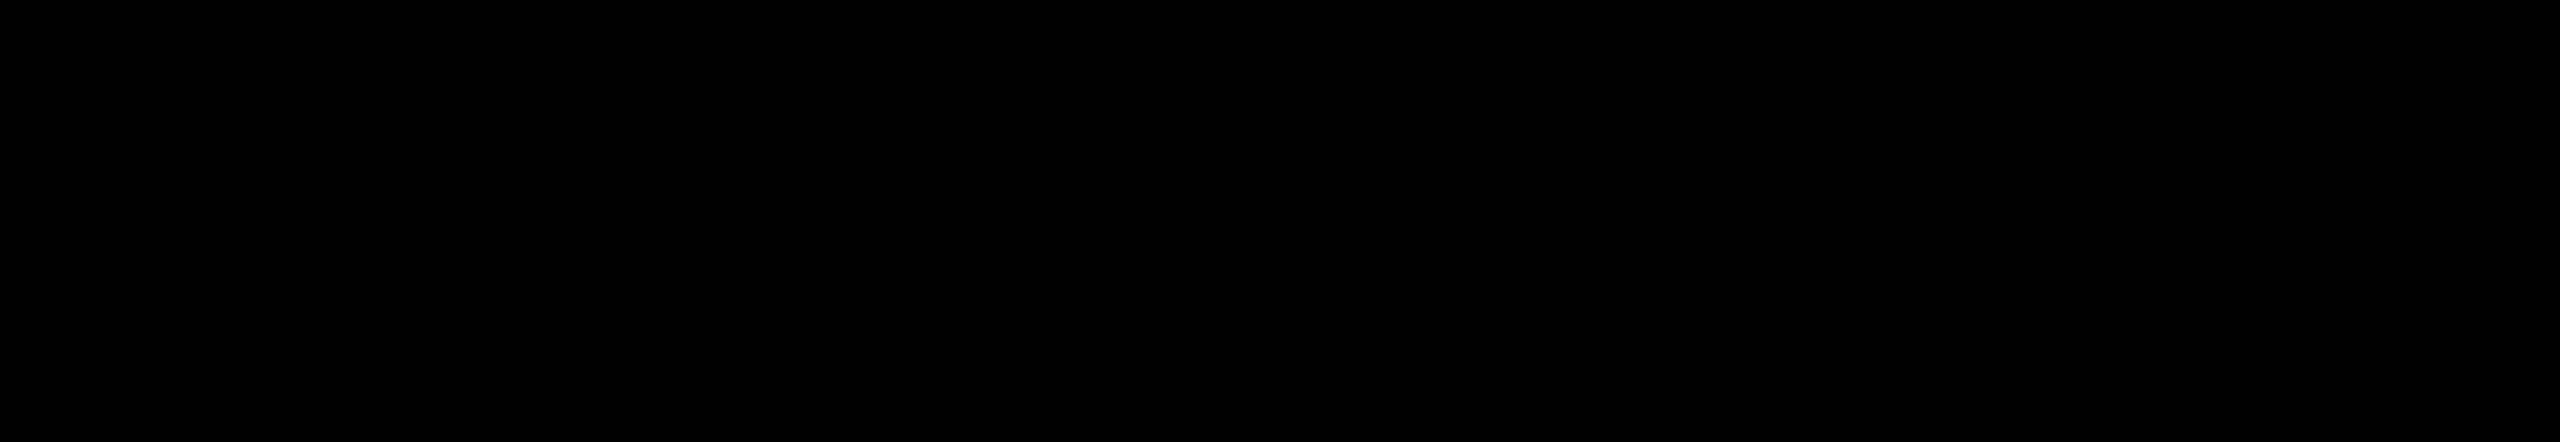 Lgnj5V.png